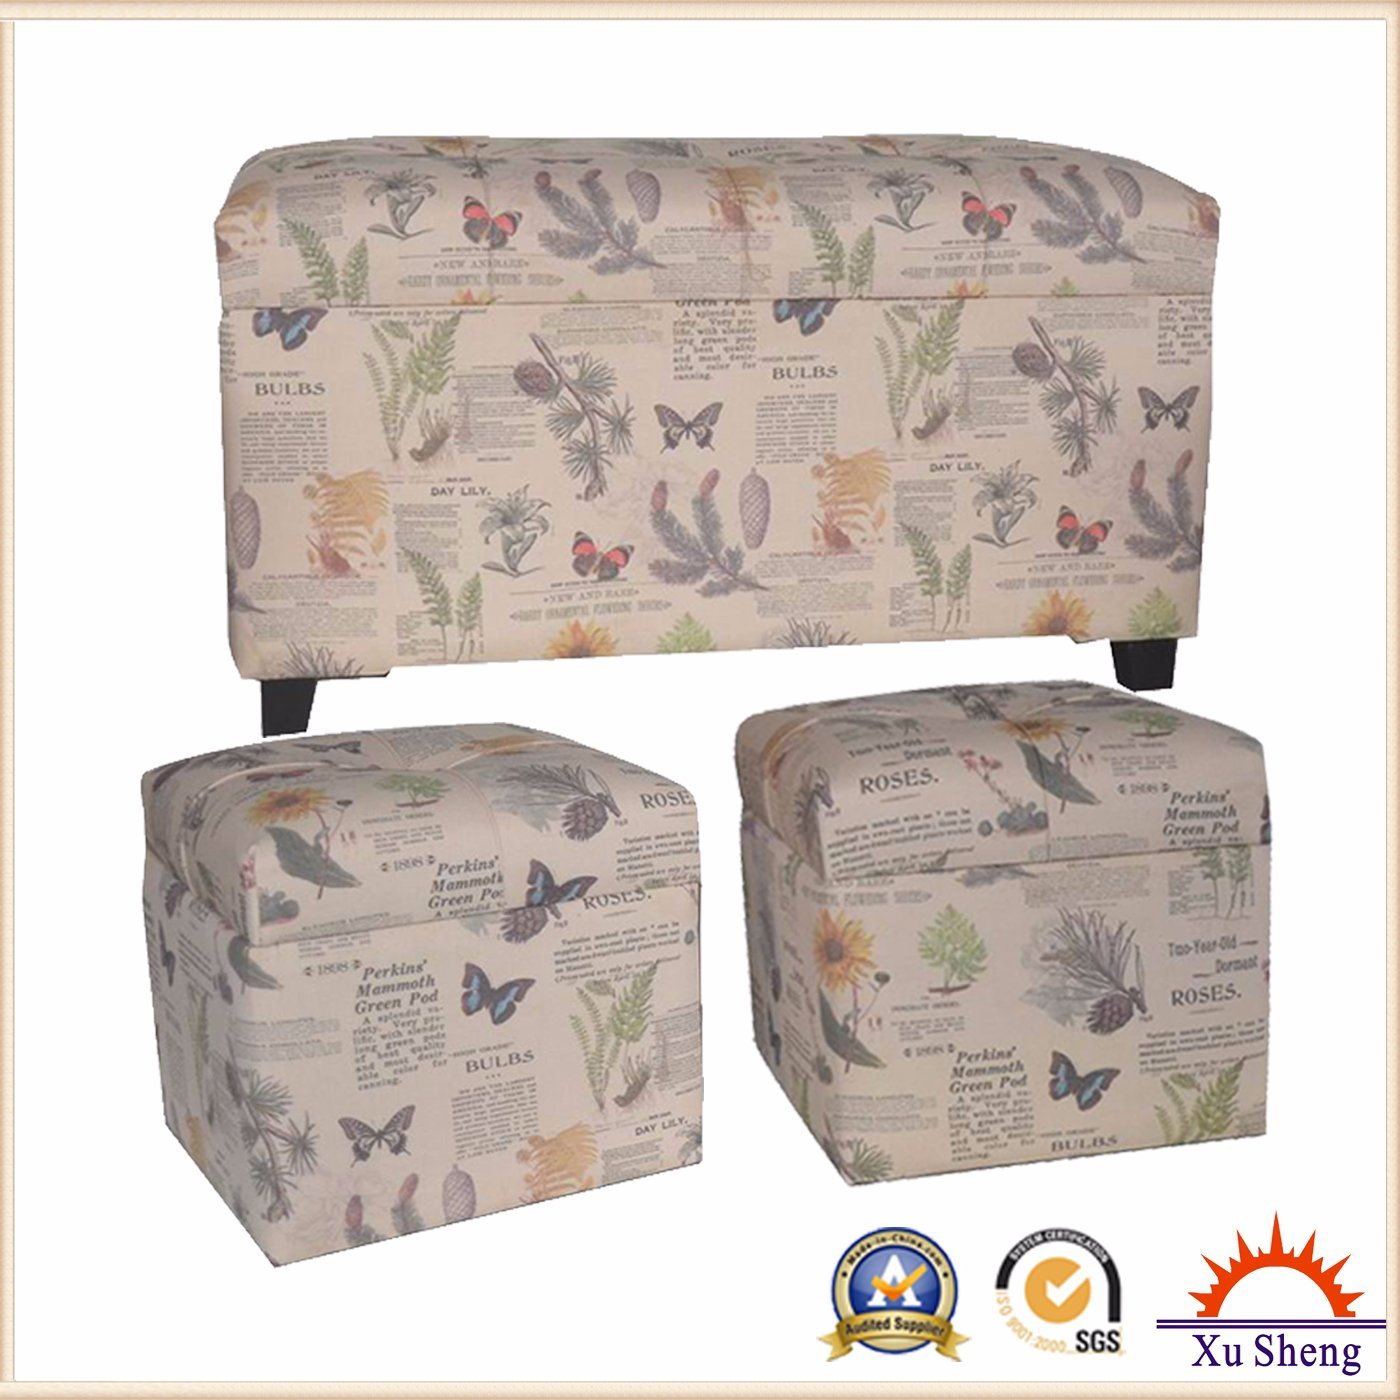 Modern Furniture Spring Fabric Print Tufted Wooden Storage Ottoman Chest Trunk